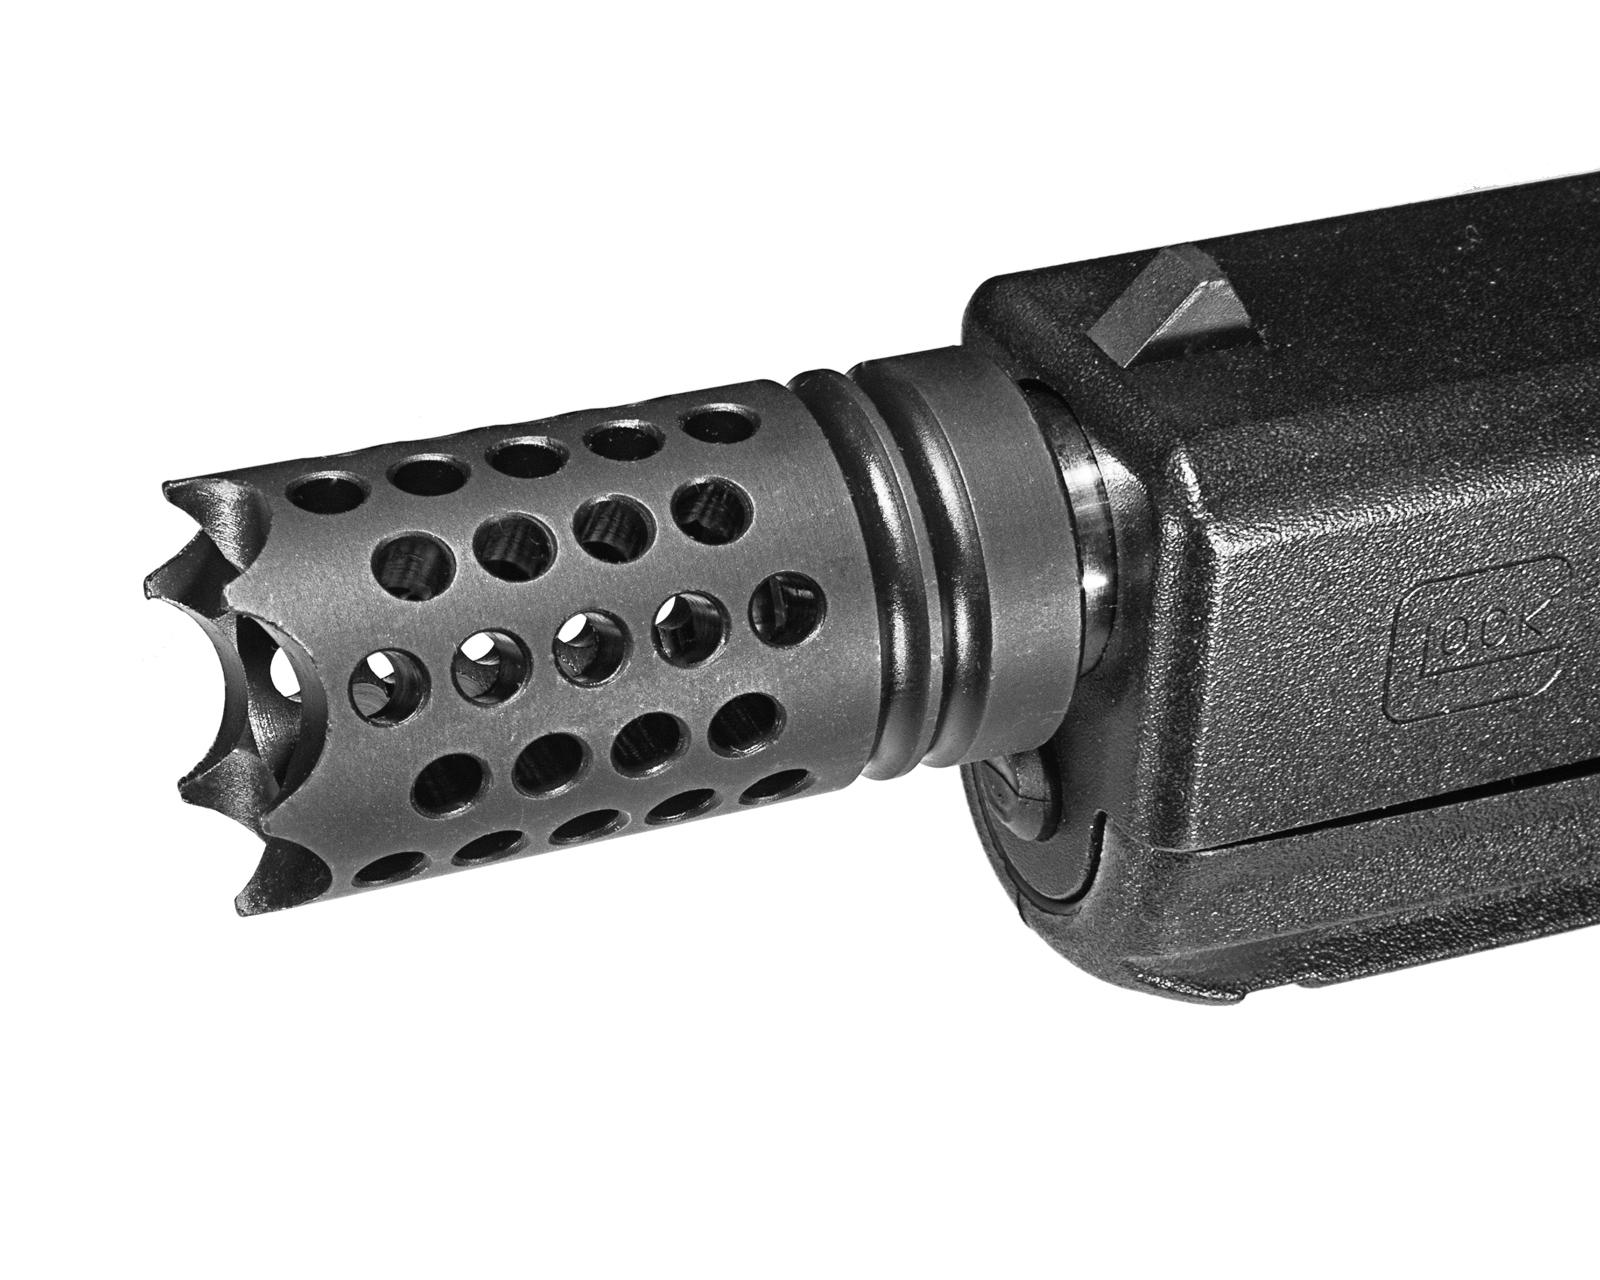 Razor Tactical Pistol Muzzle Brake